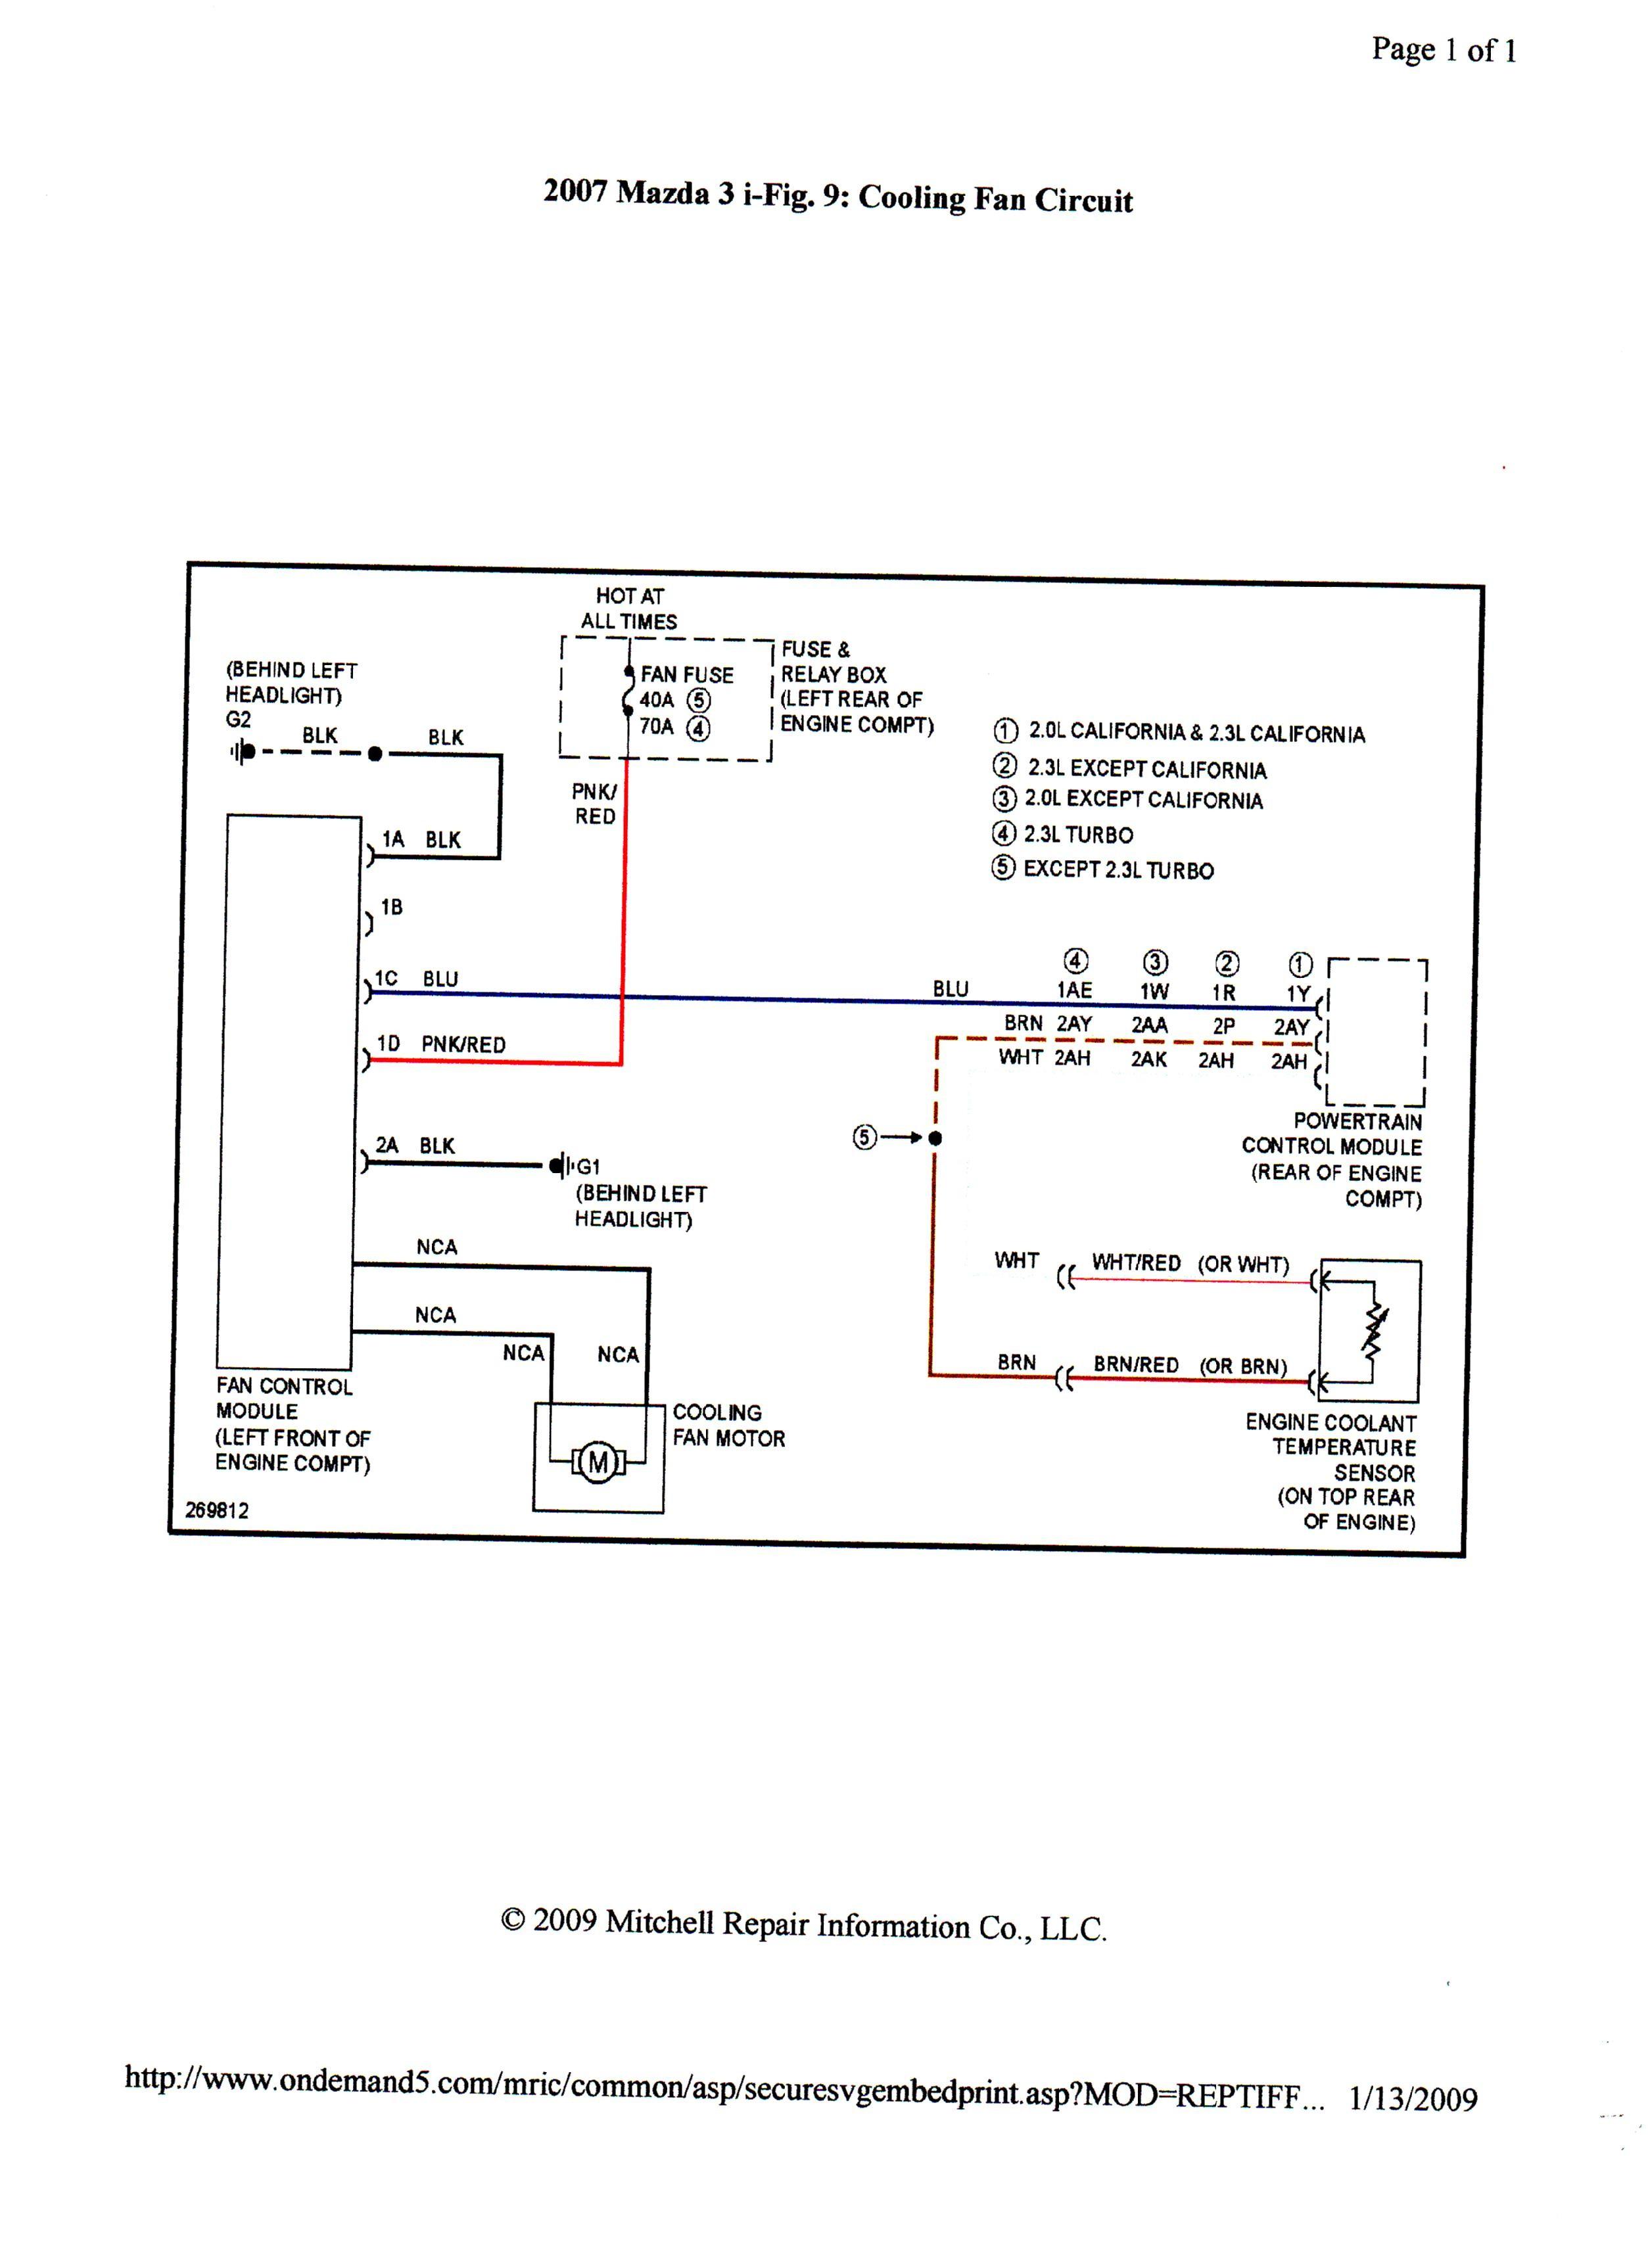 2010 Mazda 3 Wiring Diagram 098e 2007 Mazda 3 Wiring Diagram Underhood Of 2010 Mazda 3 Wiring Diagram